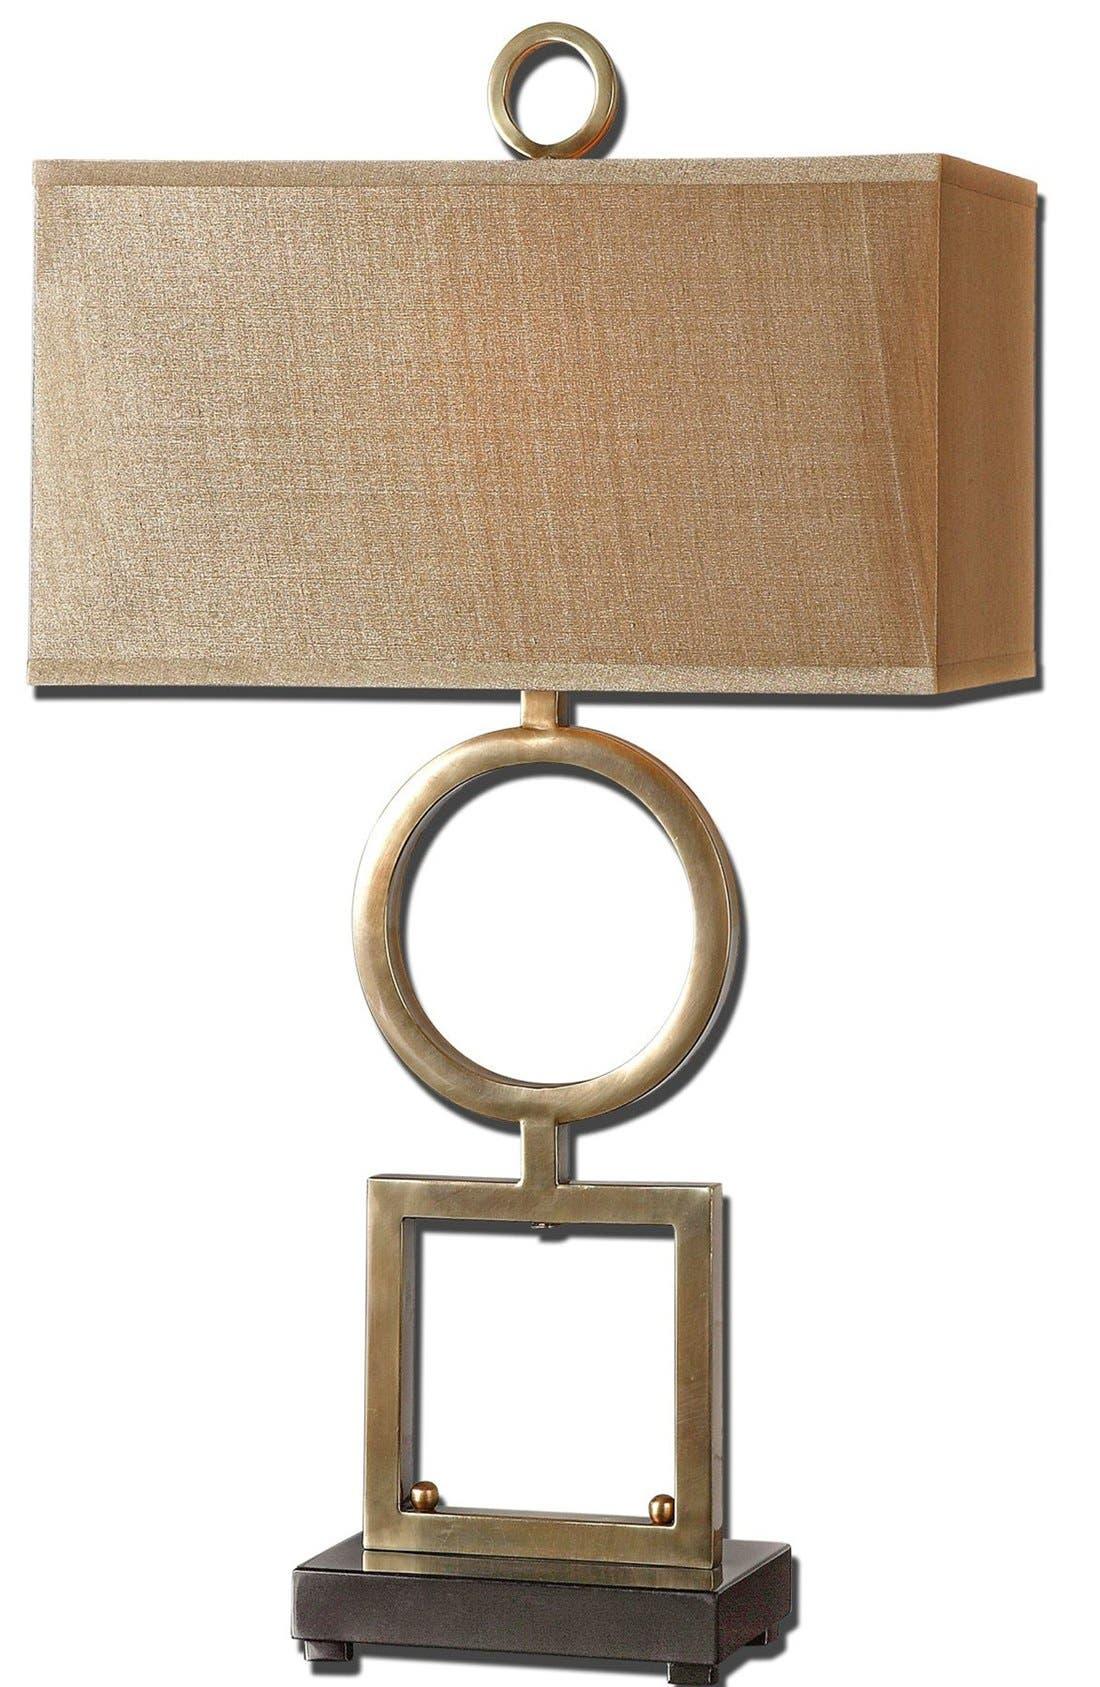 Alternate Image 1 Selected - Uttermost 'Rashawn' Table Lamp